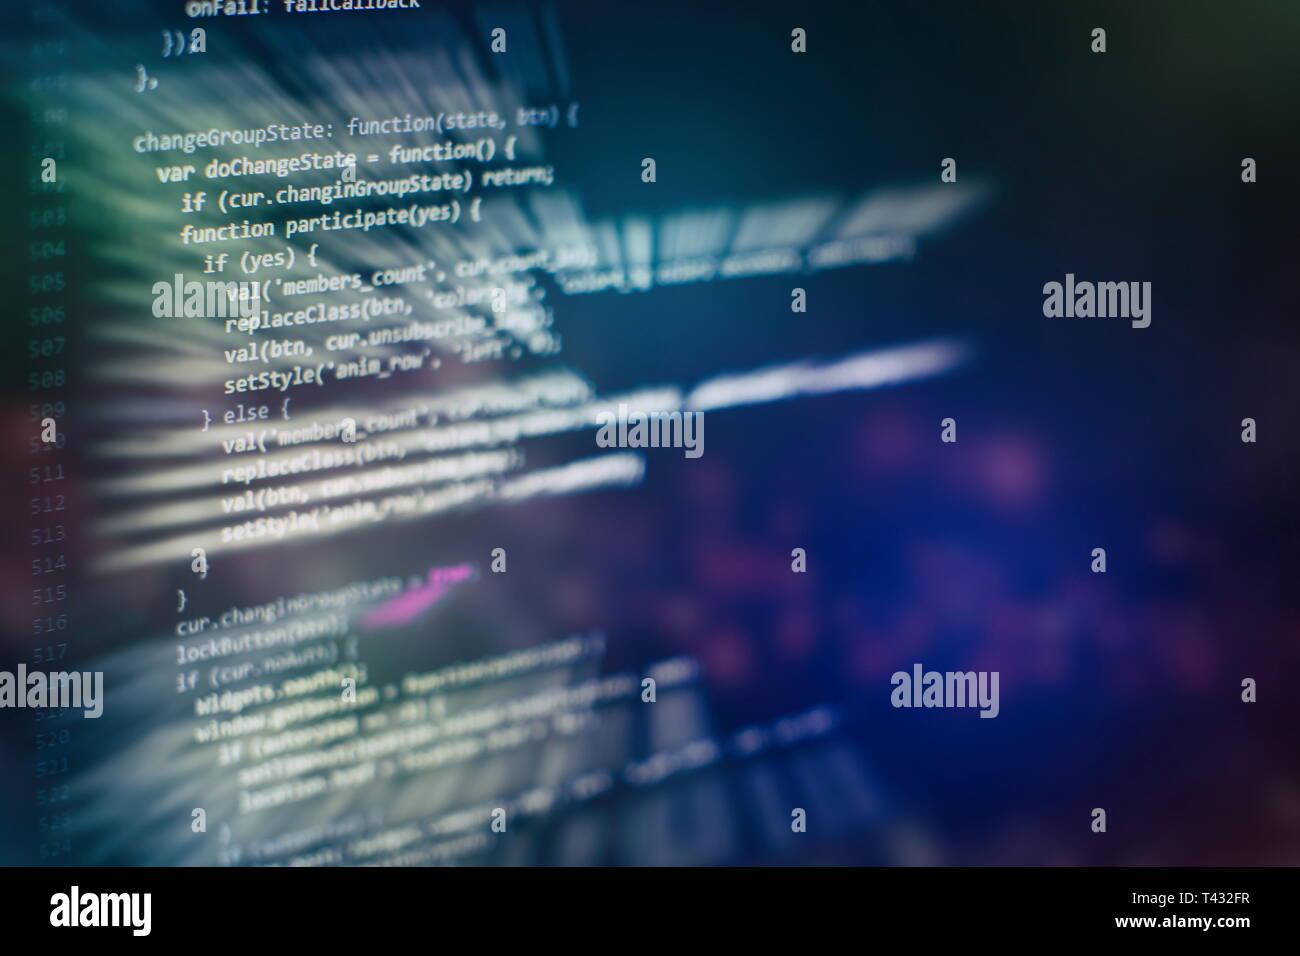 Source Code Stock Photos & Source Code Stock Images - Alamy